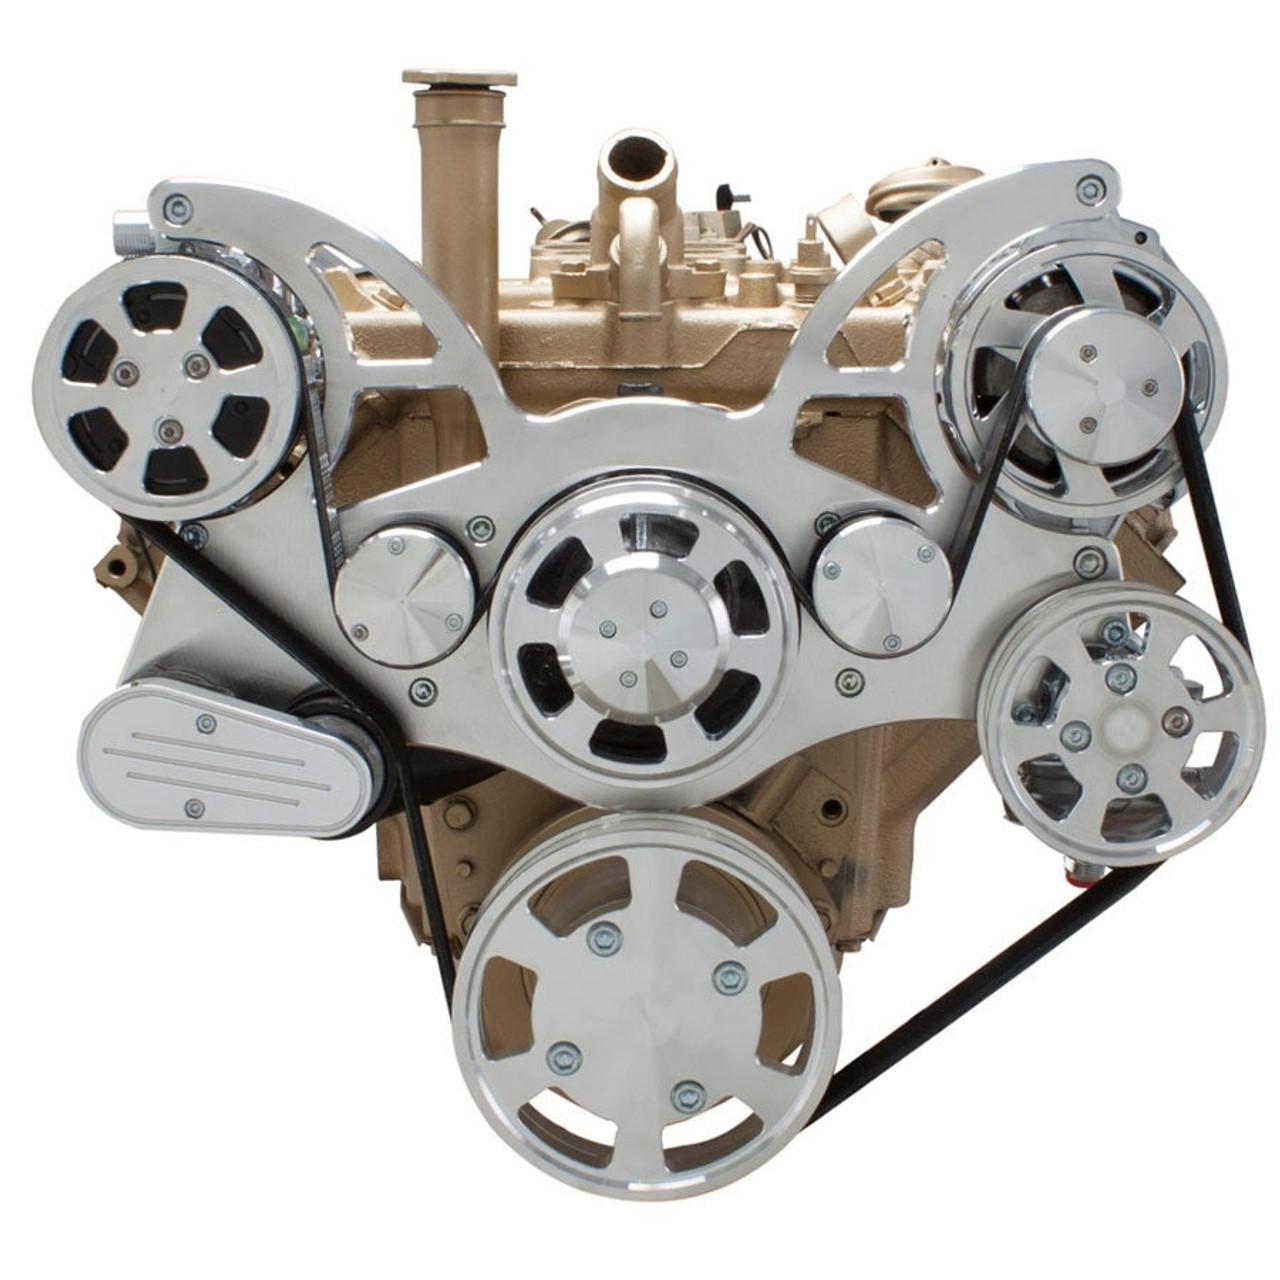 hight resolution of  97 c230 belt diagram serpentine conversion kit for oldsmobile 350